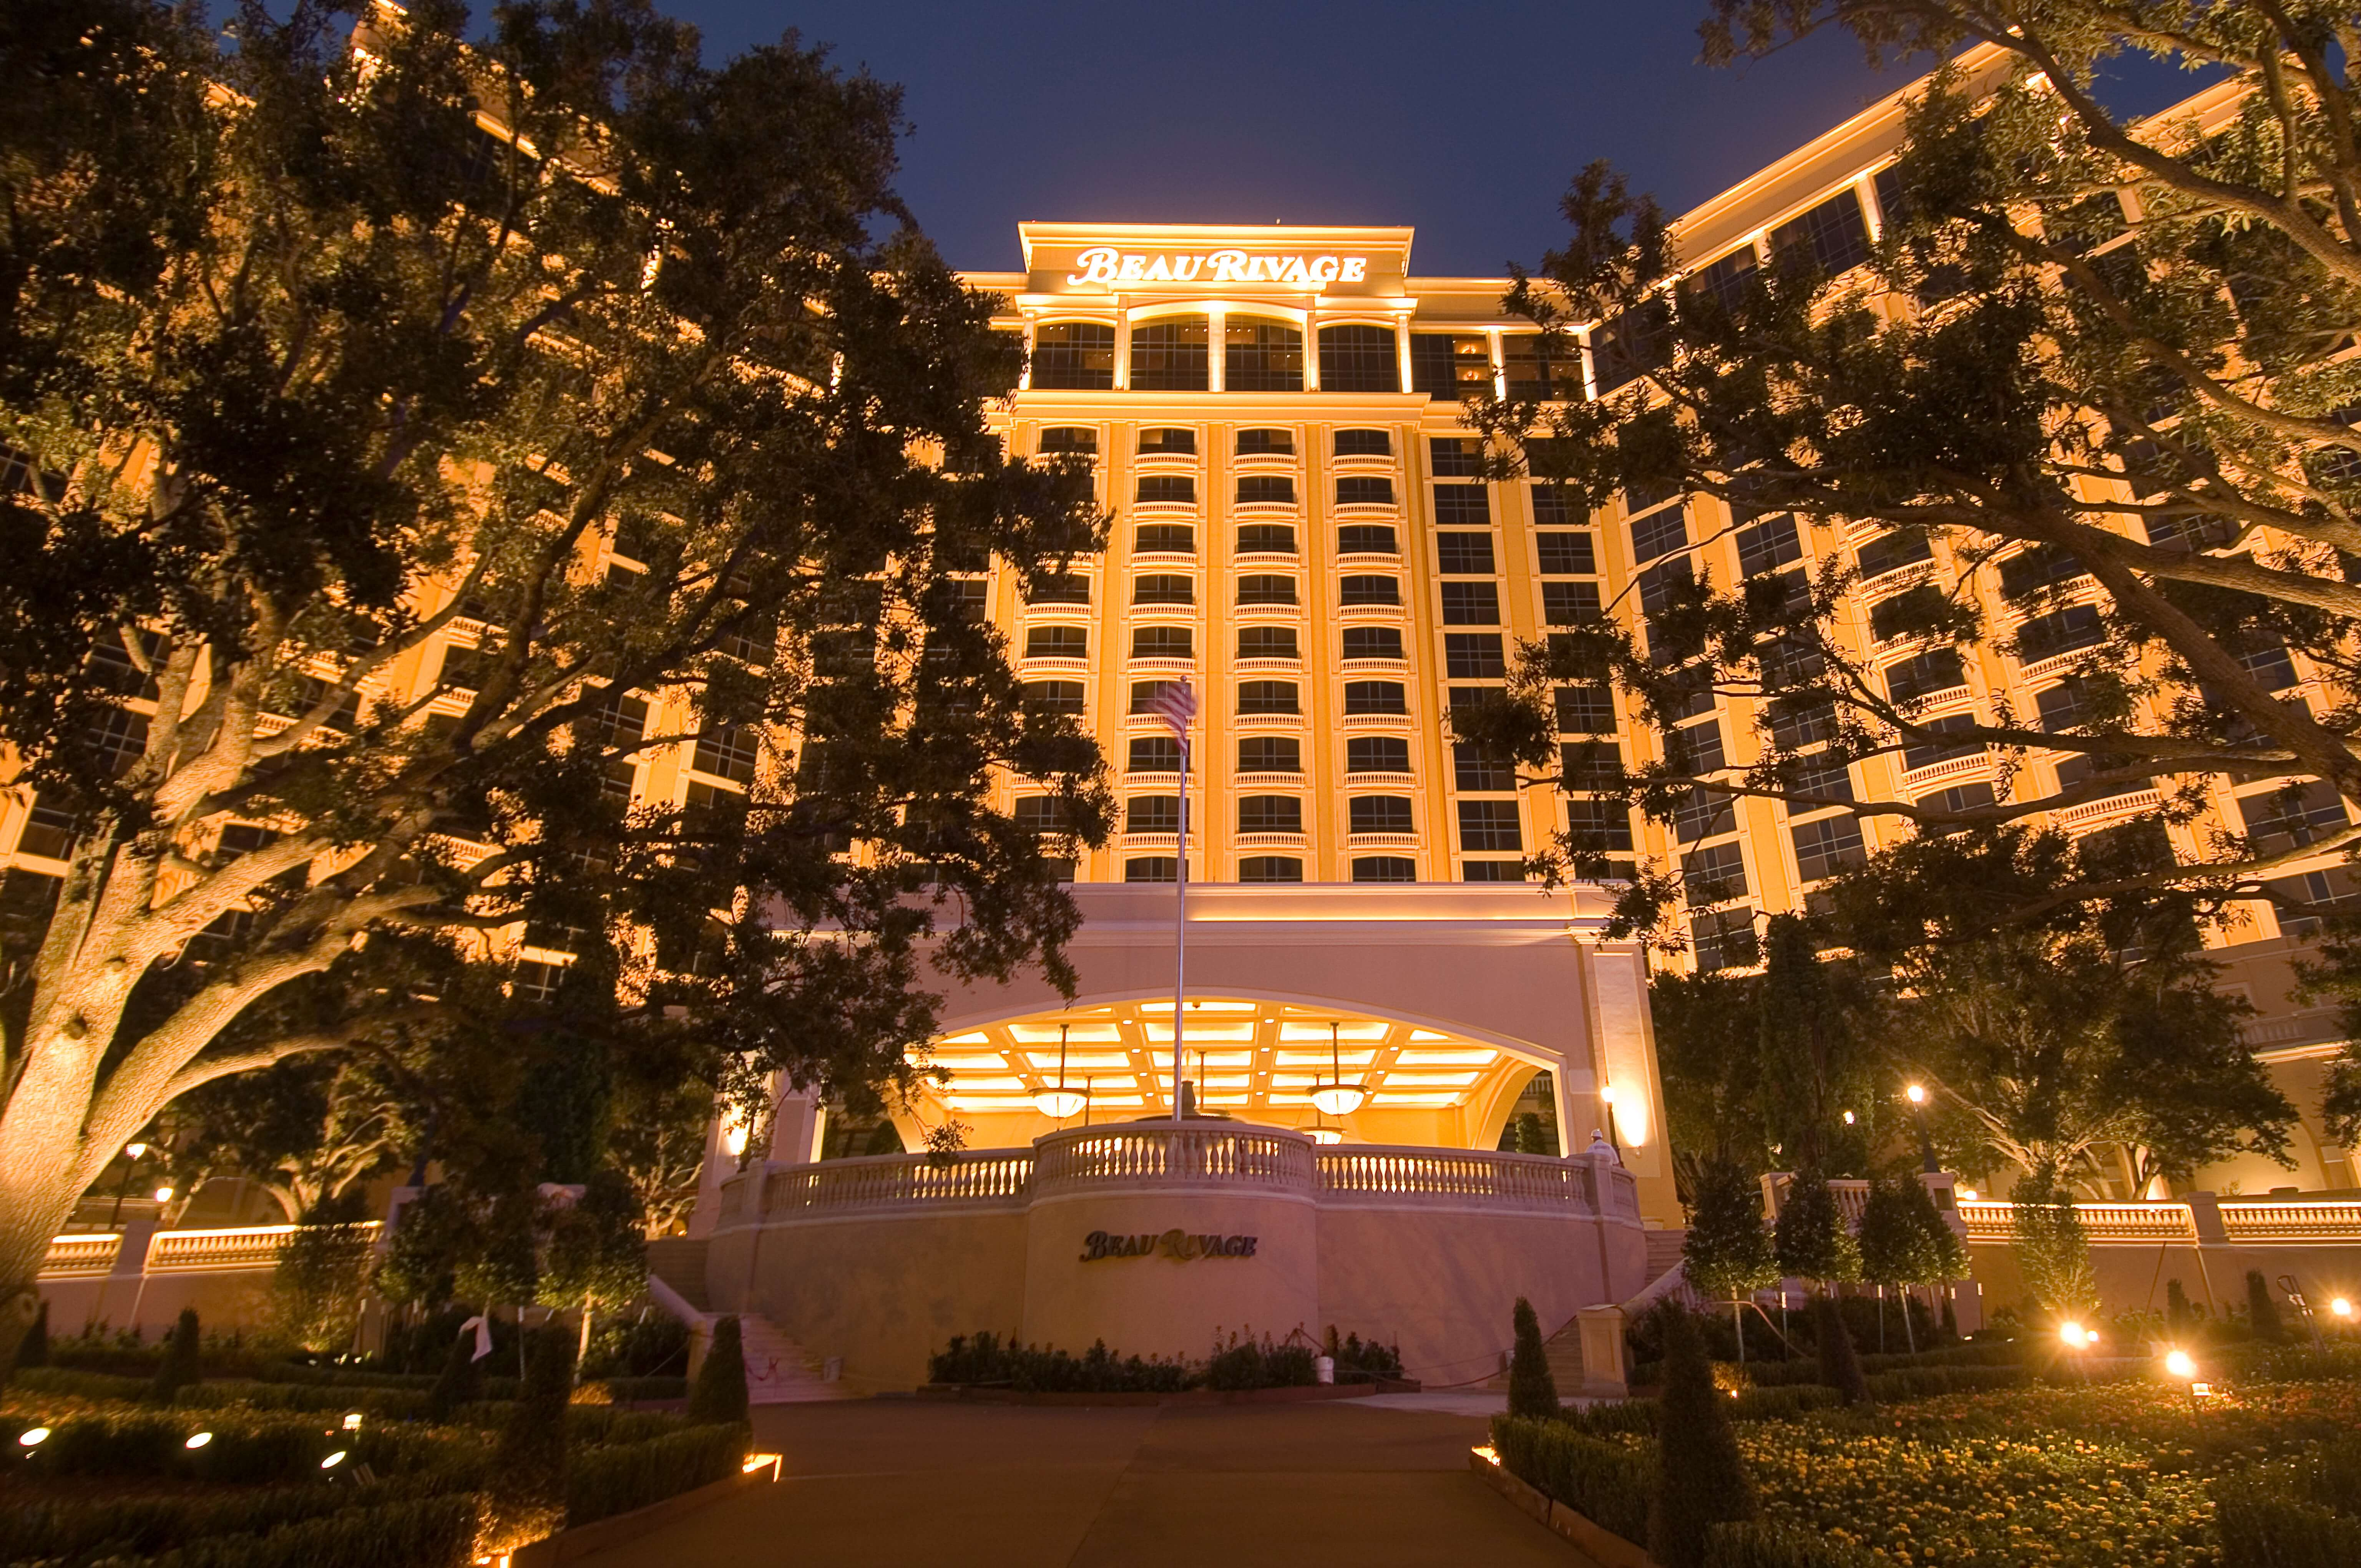 Entrance to Beau Rivage Resort & Casino, Biloxi, Mississippi